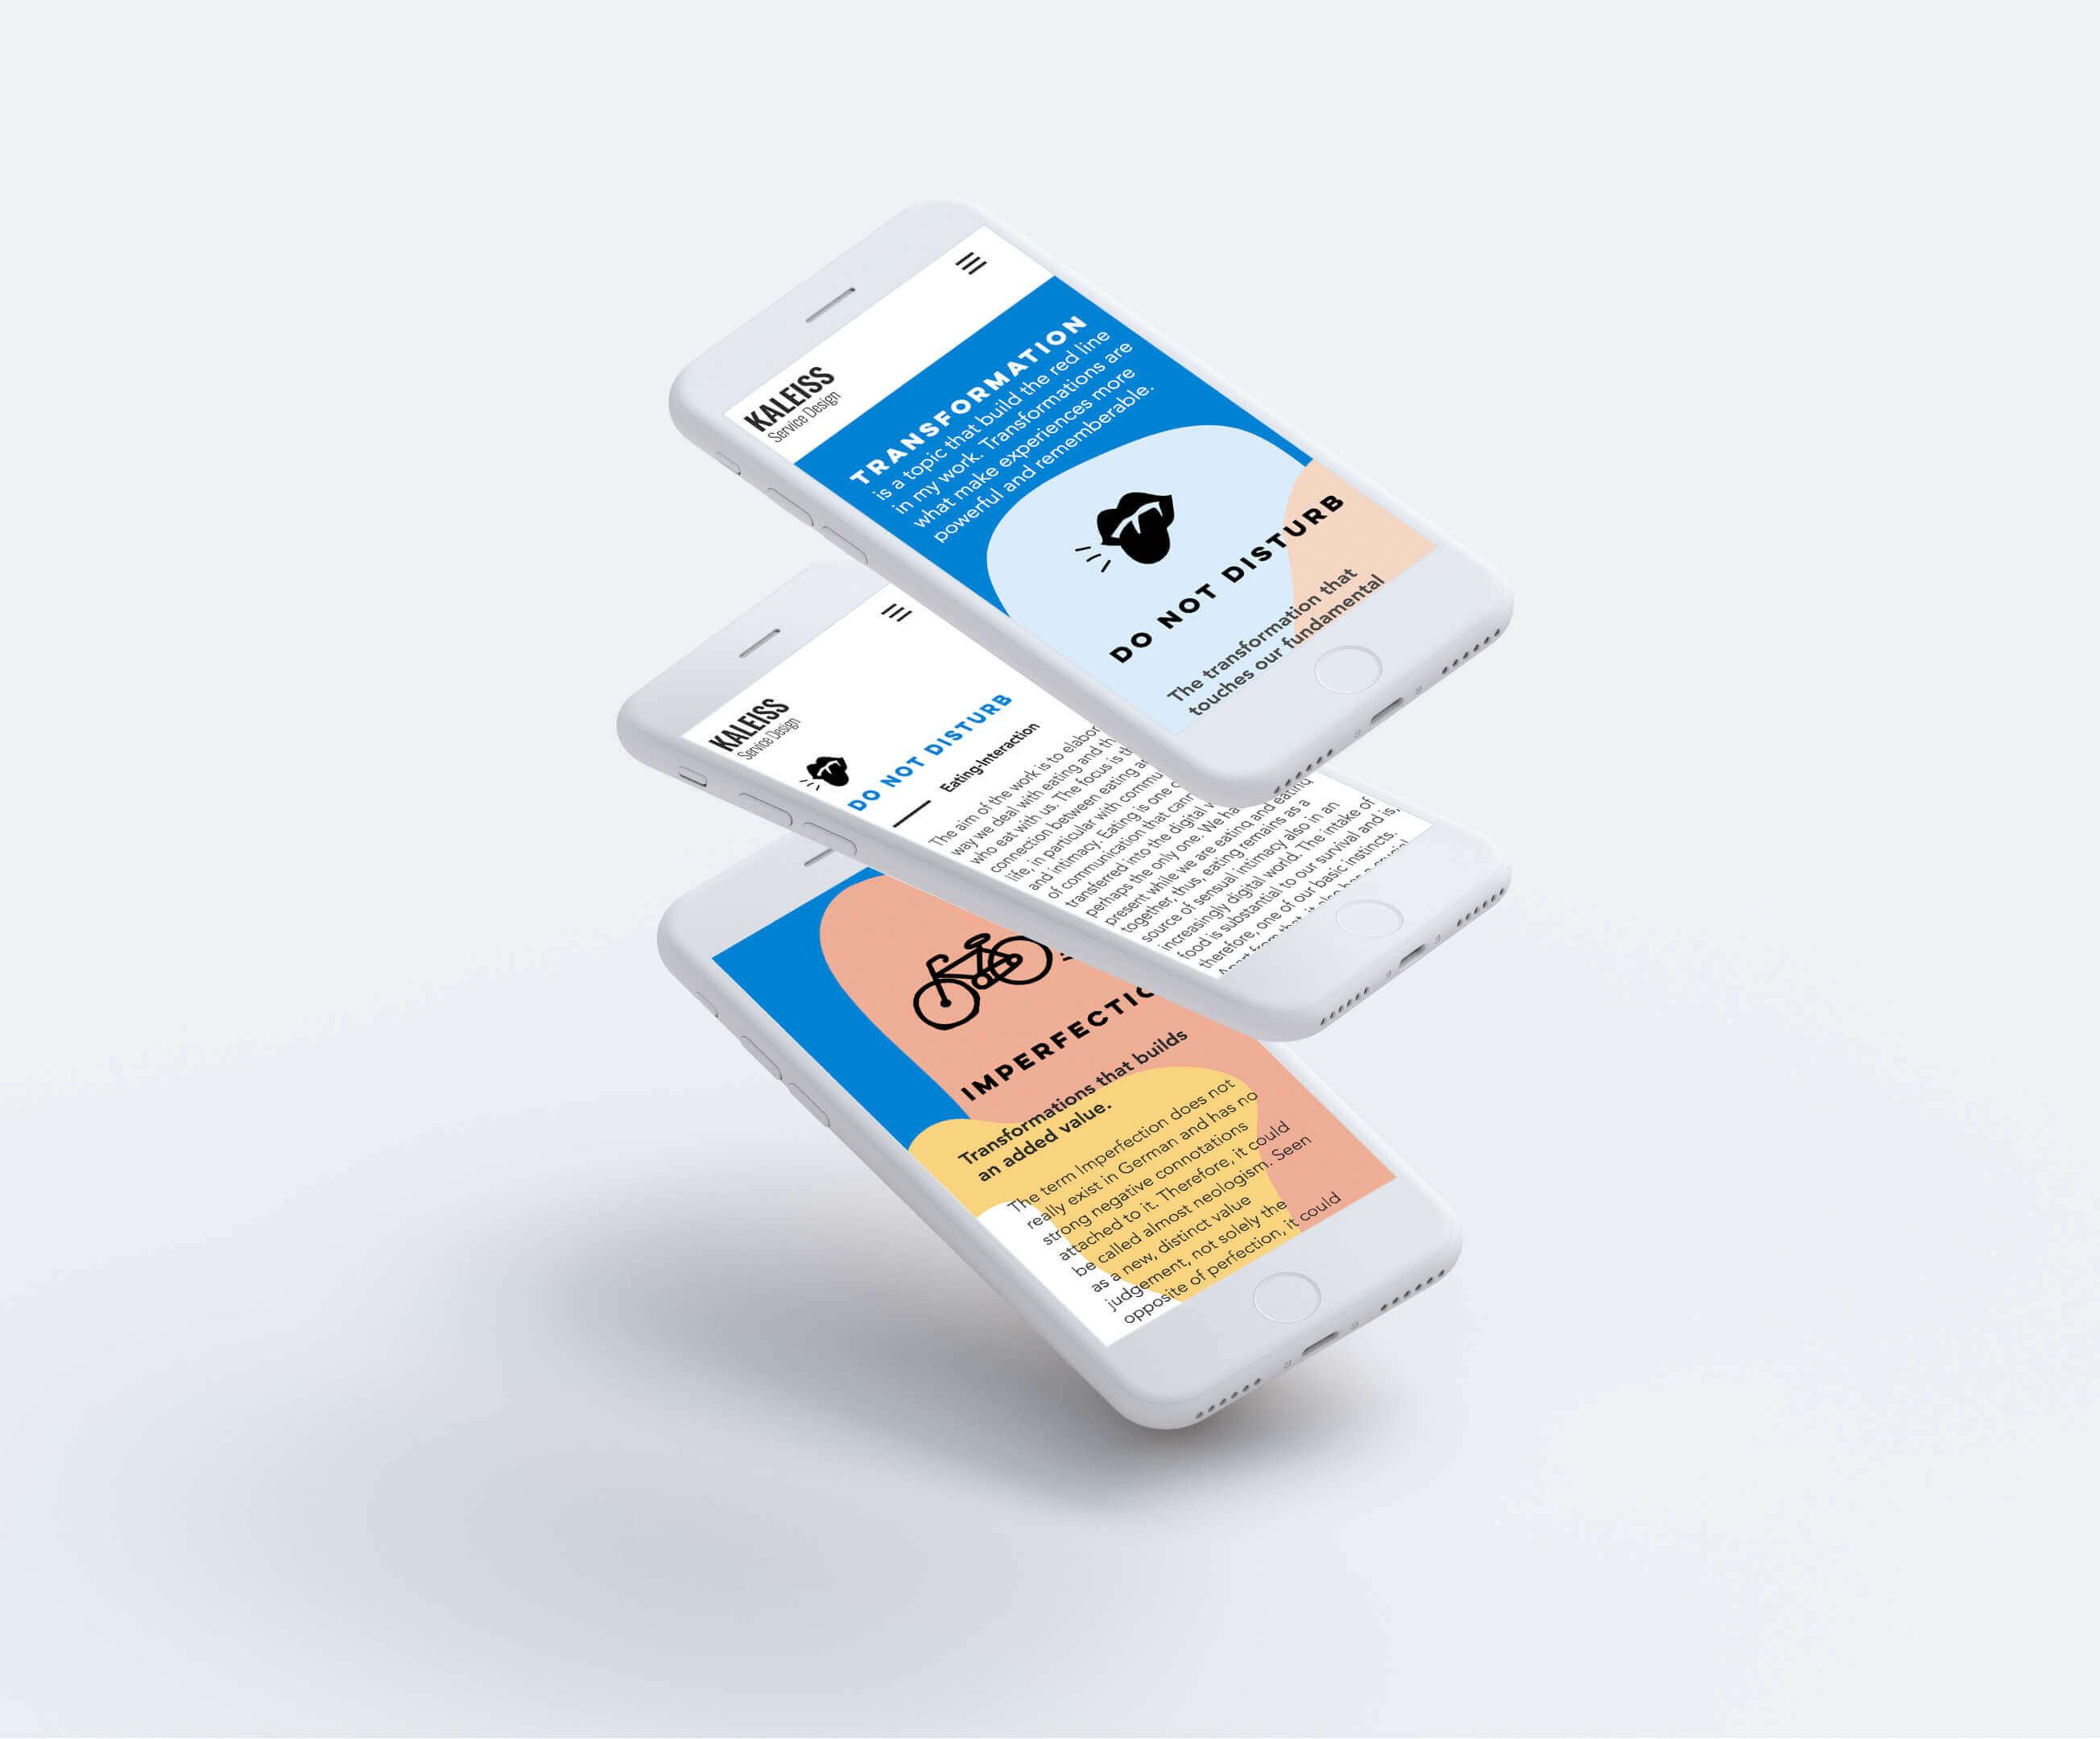 Kaleiss Website Mobile